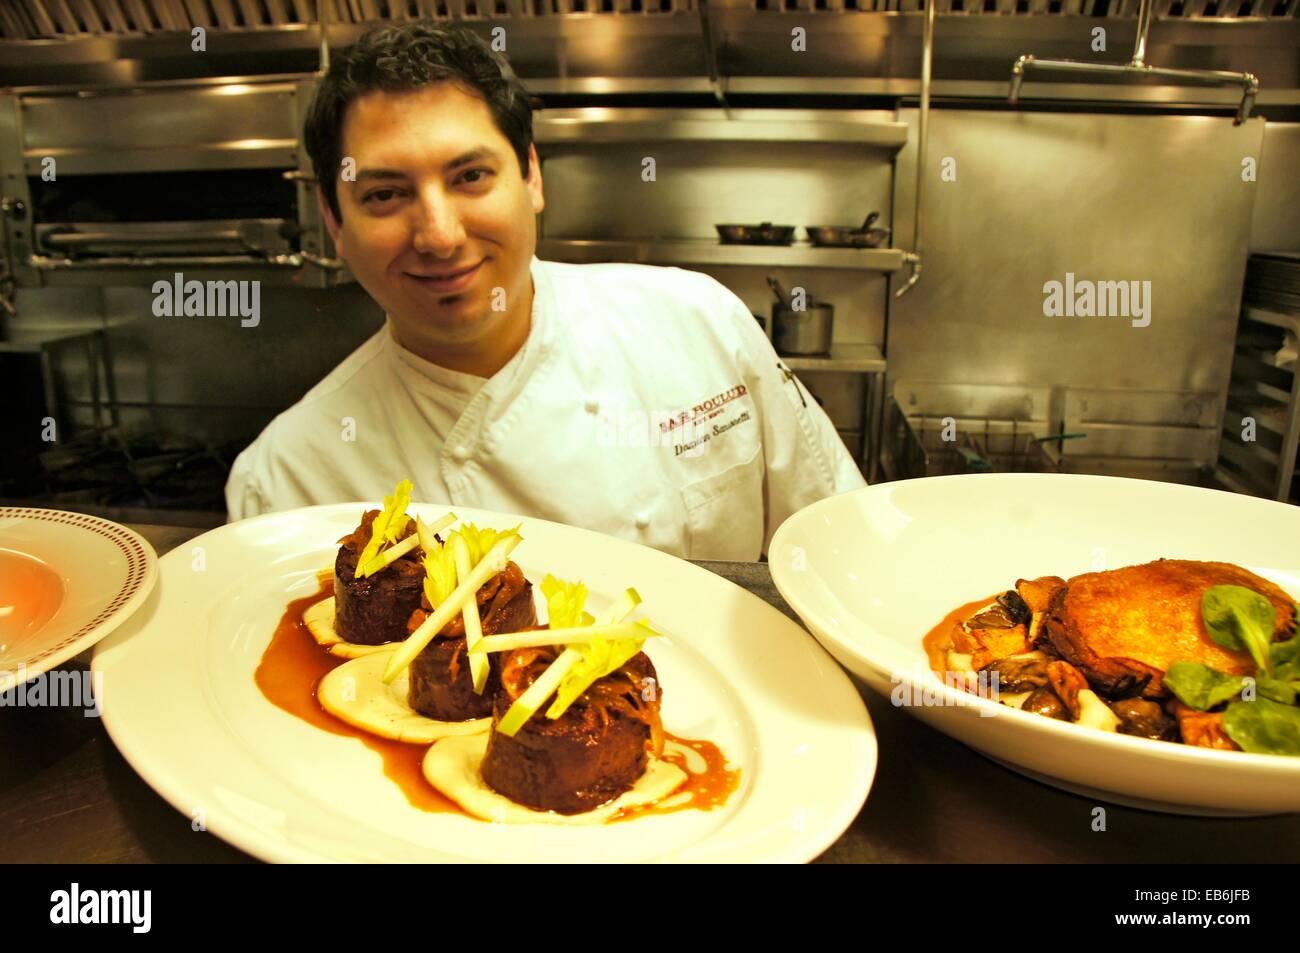 USA. New York.  Executive Chef Damian Sansonetti of ´Bar Boulud´ - Stock Image